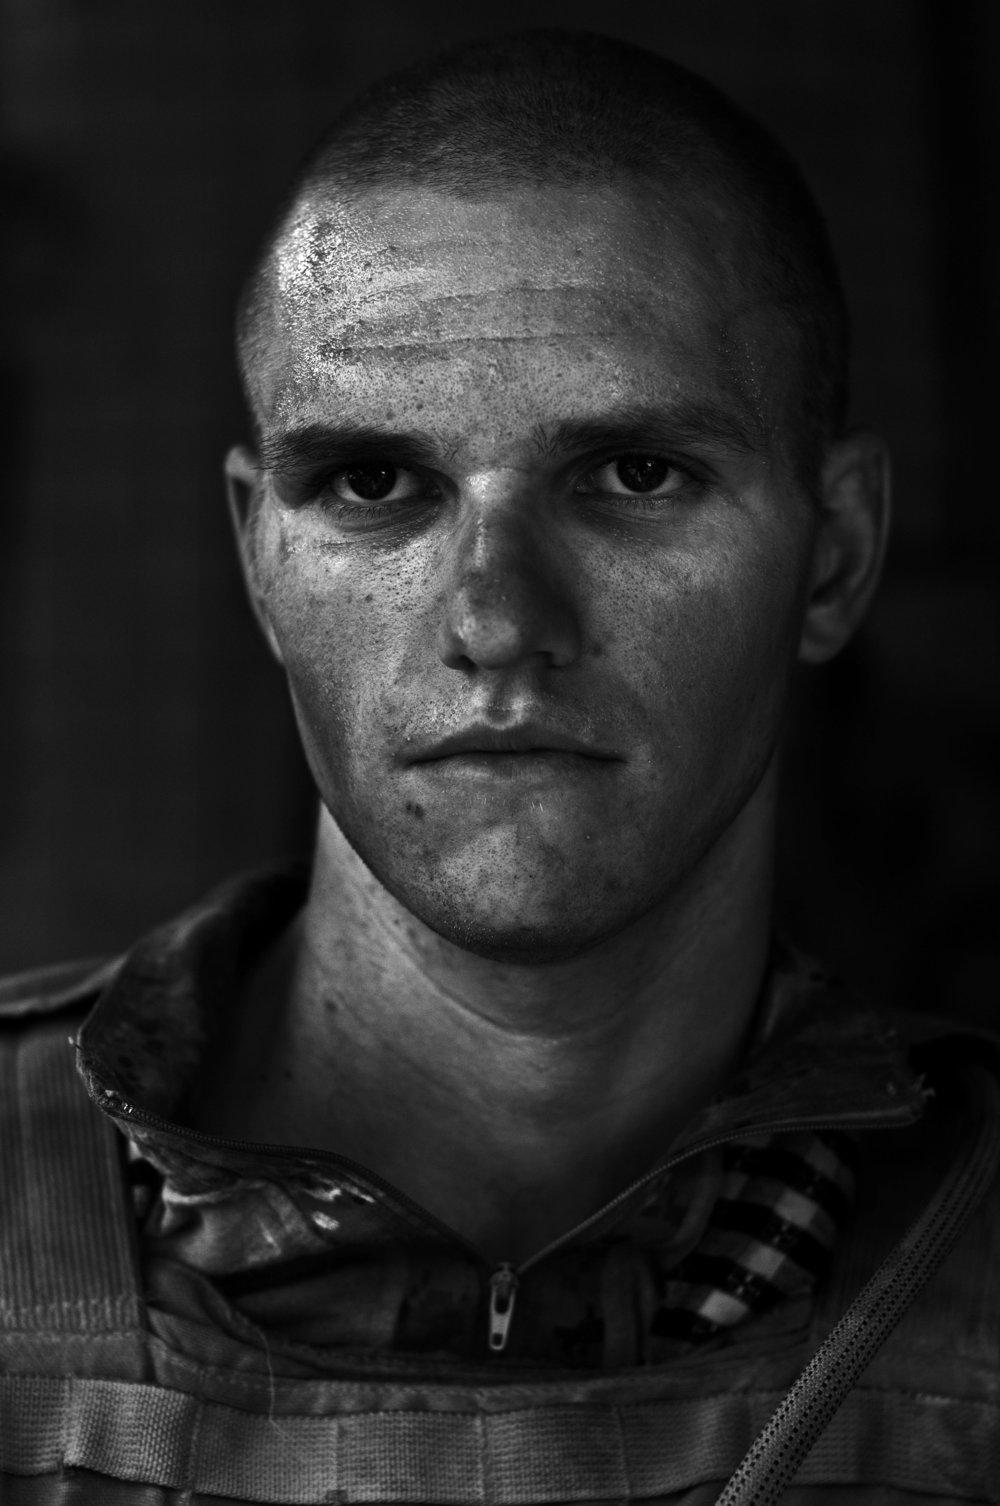 7-U.S. Marine Lcpl. Theodore Dykstra